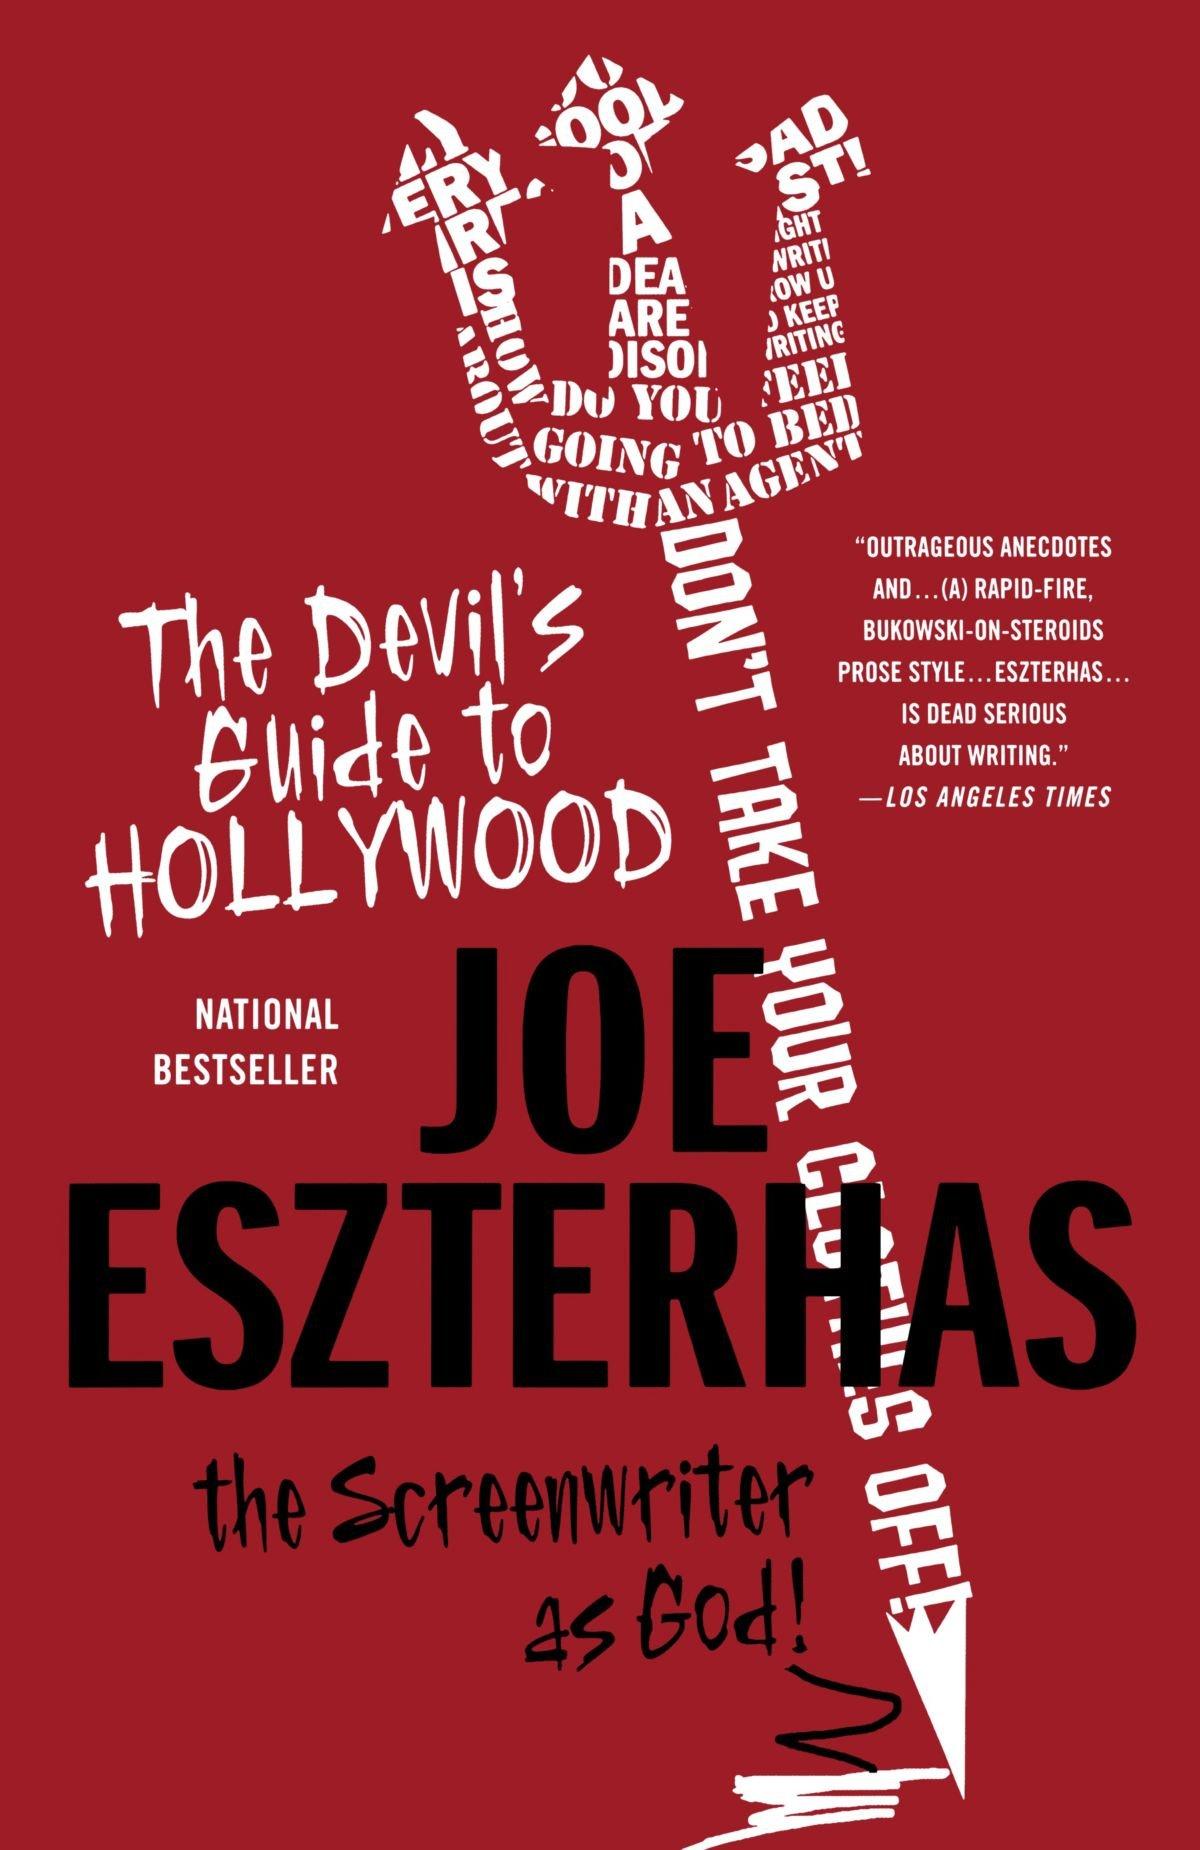 The Devil's Guide to Hollywood: The Screenwriter as God!: Joe Eszterhas:  9780312373849: Amazon.com: Books